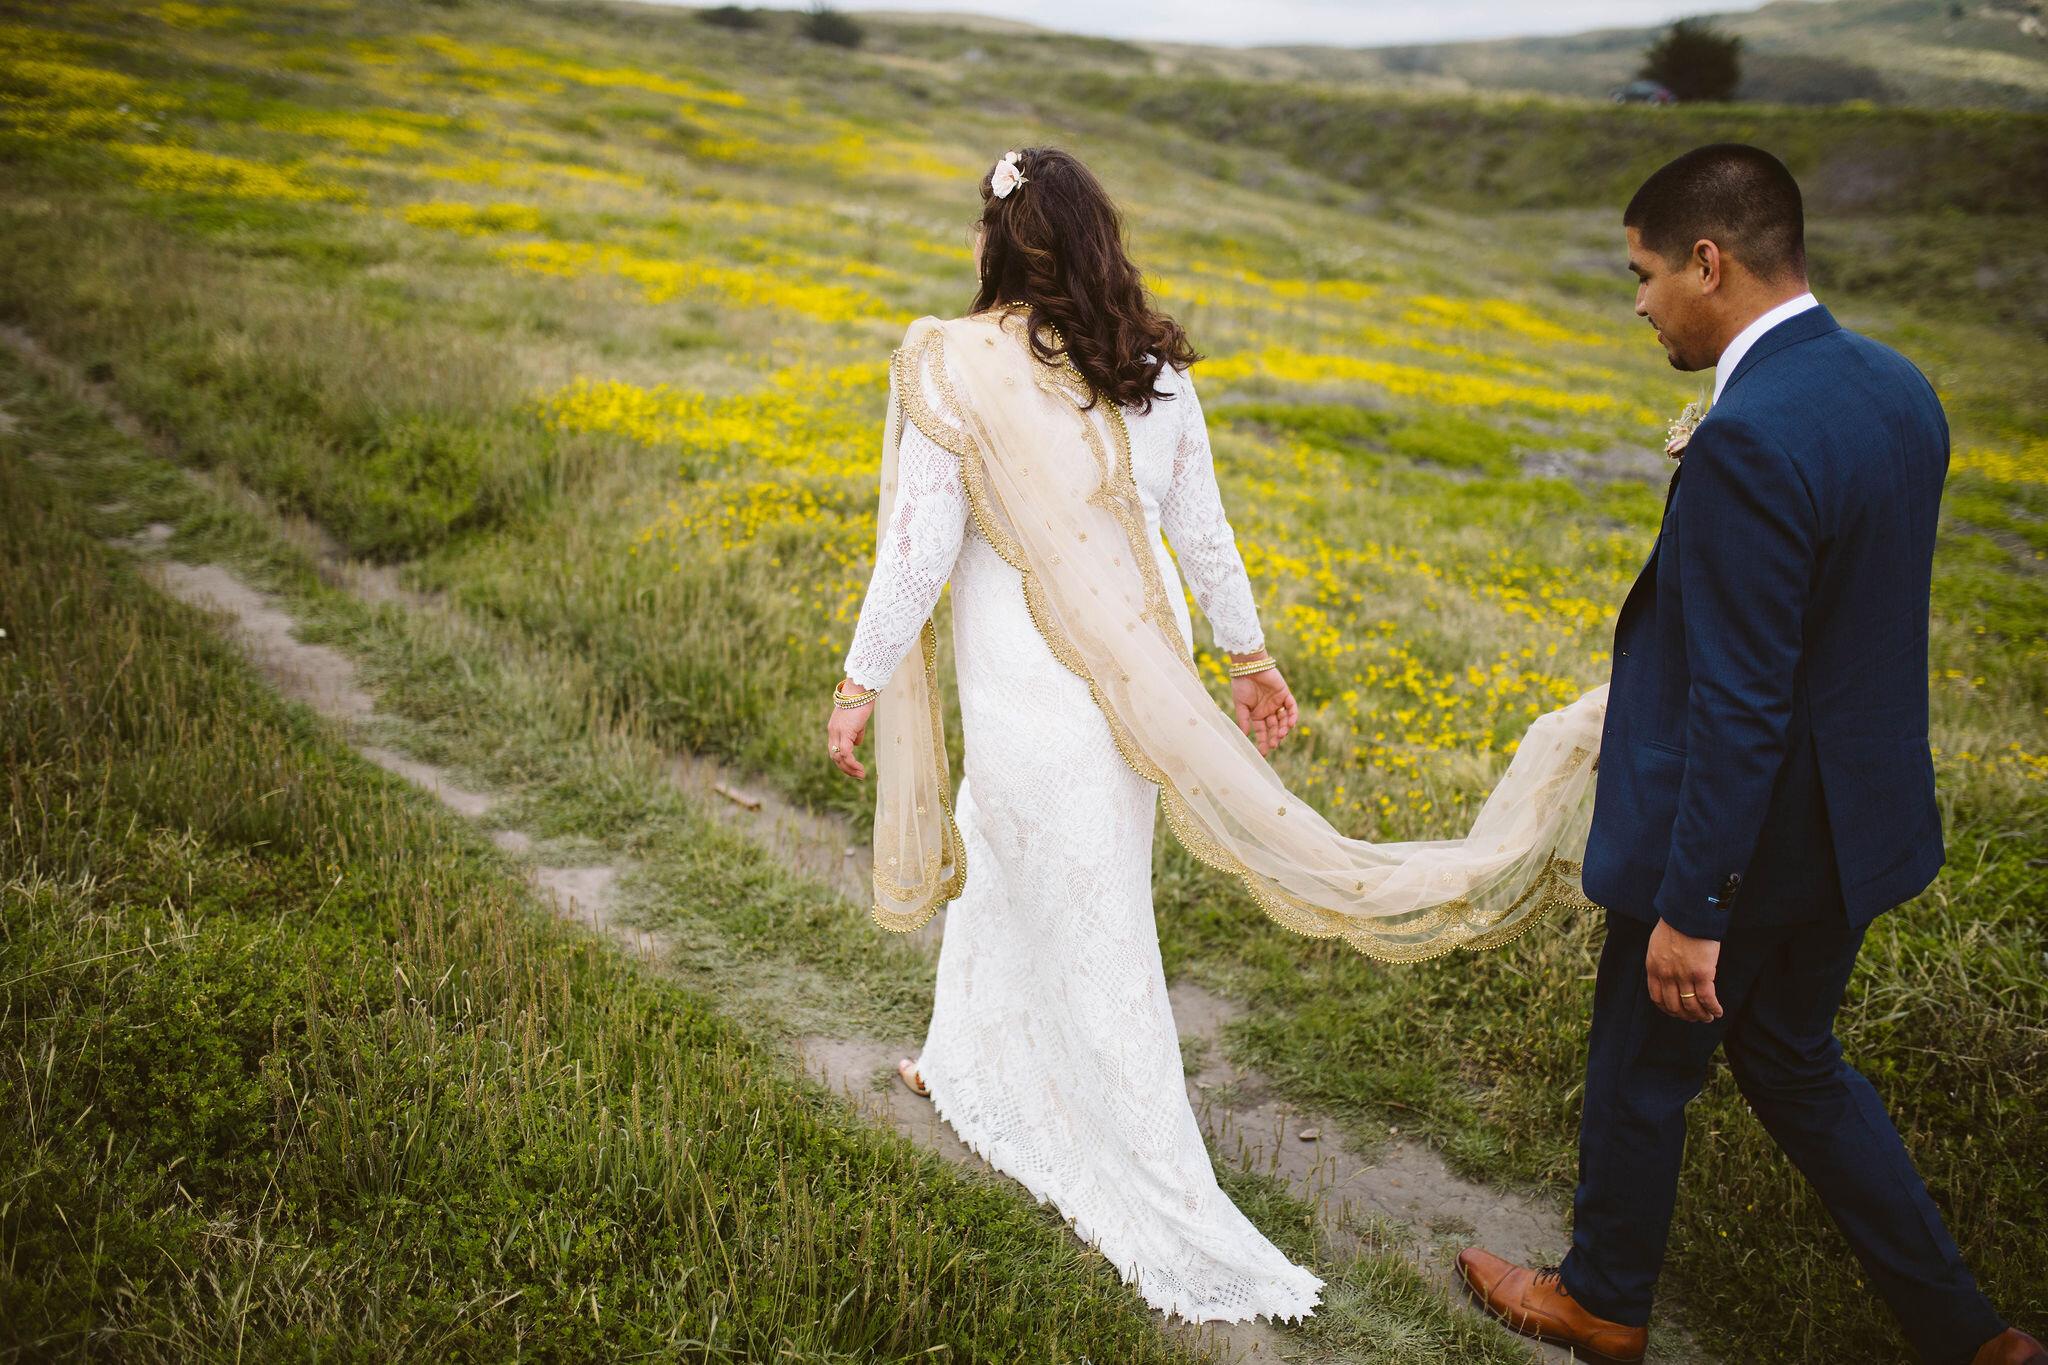 Venture-Retreat-Center-Wedding-Pescadero-Sat-Aaron-Pritam-The-Shalom-Imaginative-423.jpg